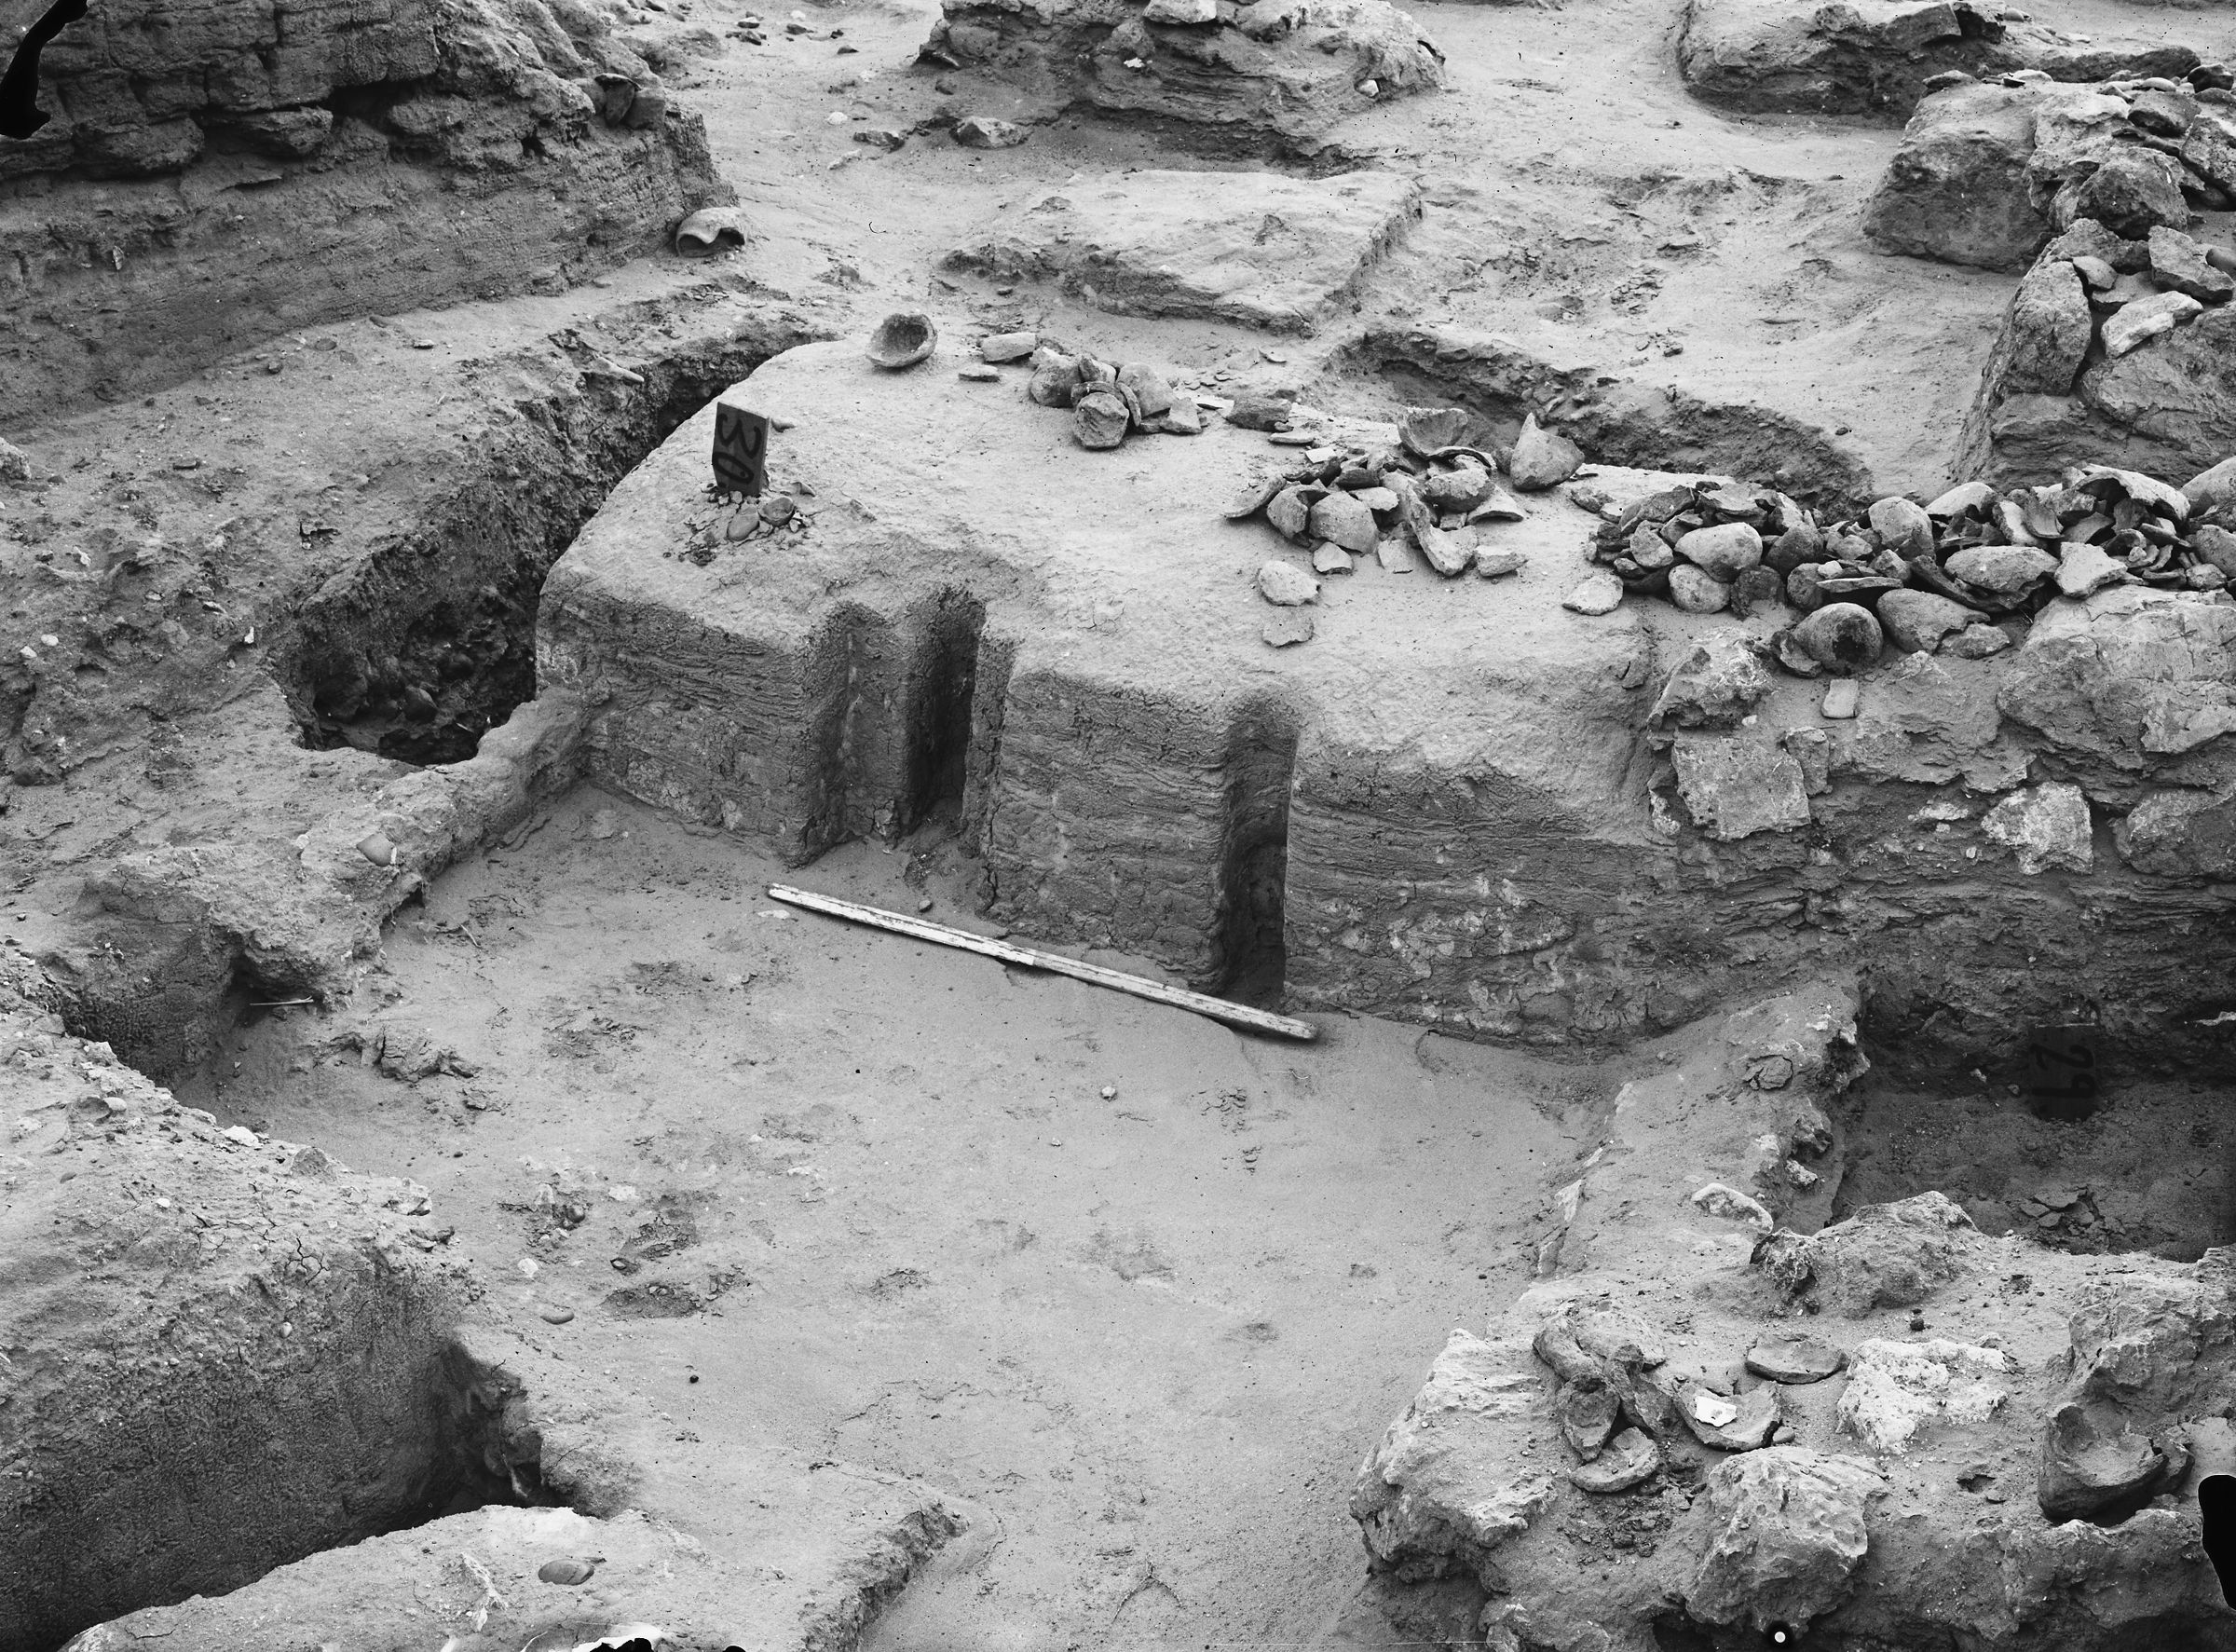 Wadi Cemetery (Reisner; north of W. Cem): Site: Giza; View: GW 20, GW 27, GW 29, GW 30, GW 31, GW 46, GW 47, GW 48, GW 49